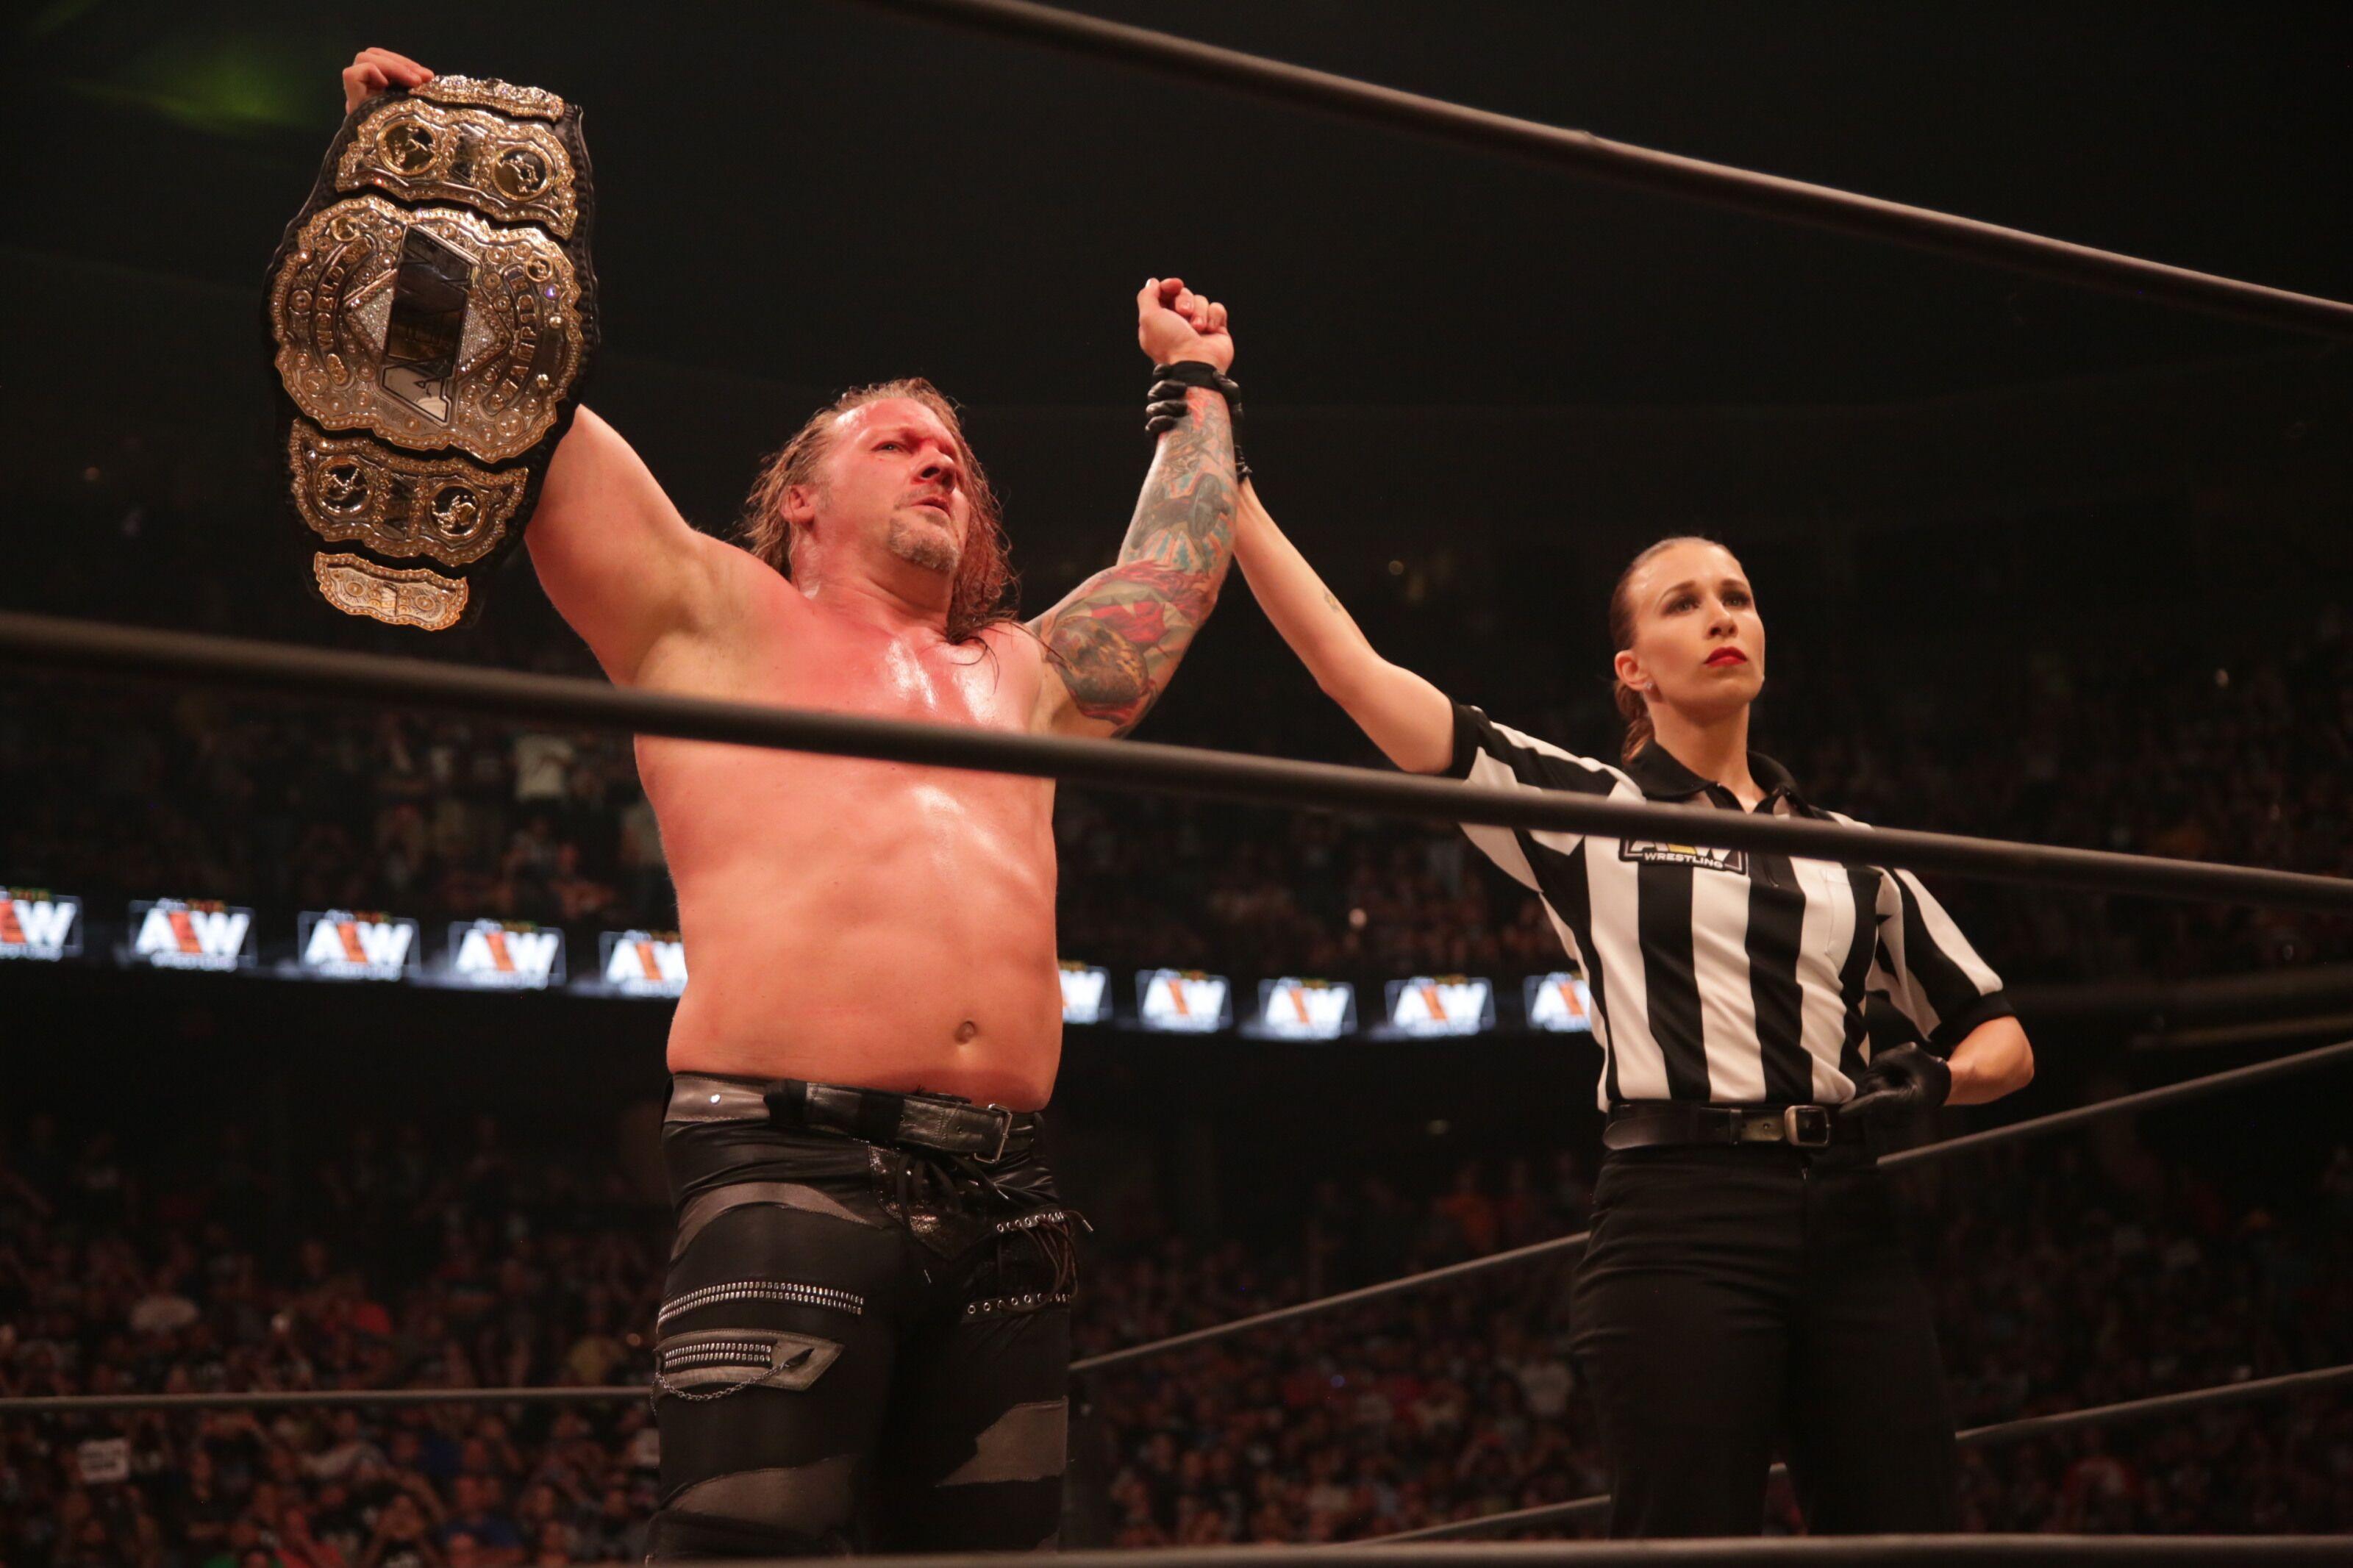 Chris Jericho's missing AEW World Championship title found